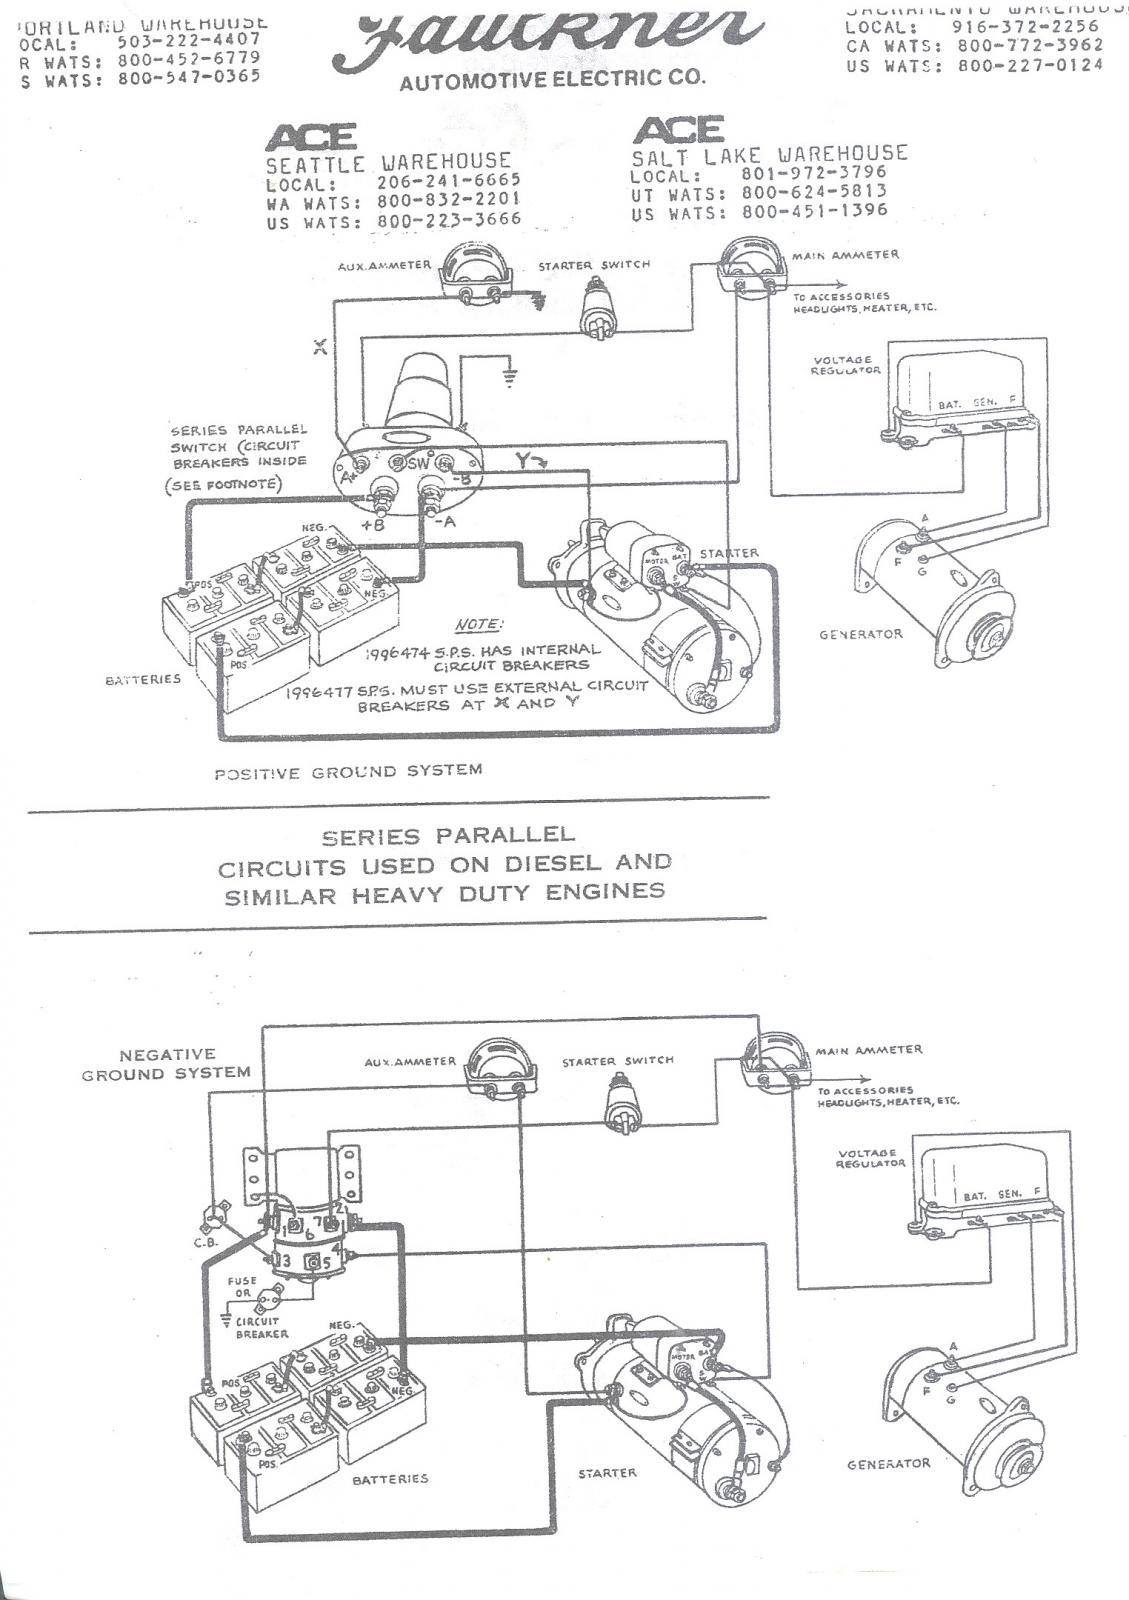 chevy truck wiring diagram wwwjustanswercom chevy 5rtmu1979mack wire diagram auto electrical wiring diagramwiring diagrams for mack trucks u2013 the wiring diagram